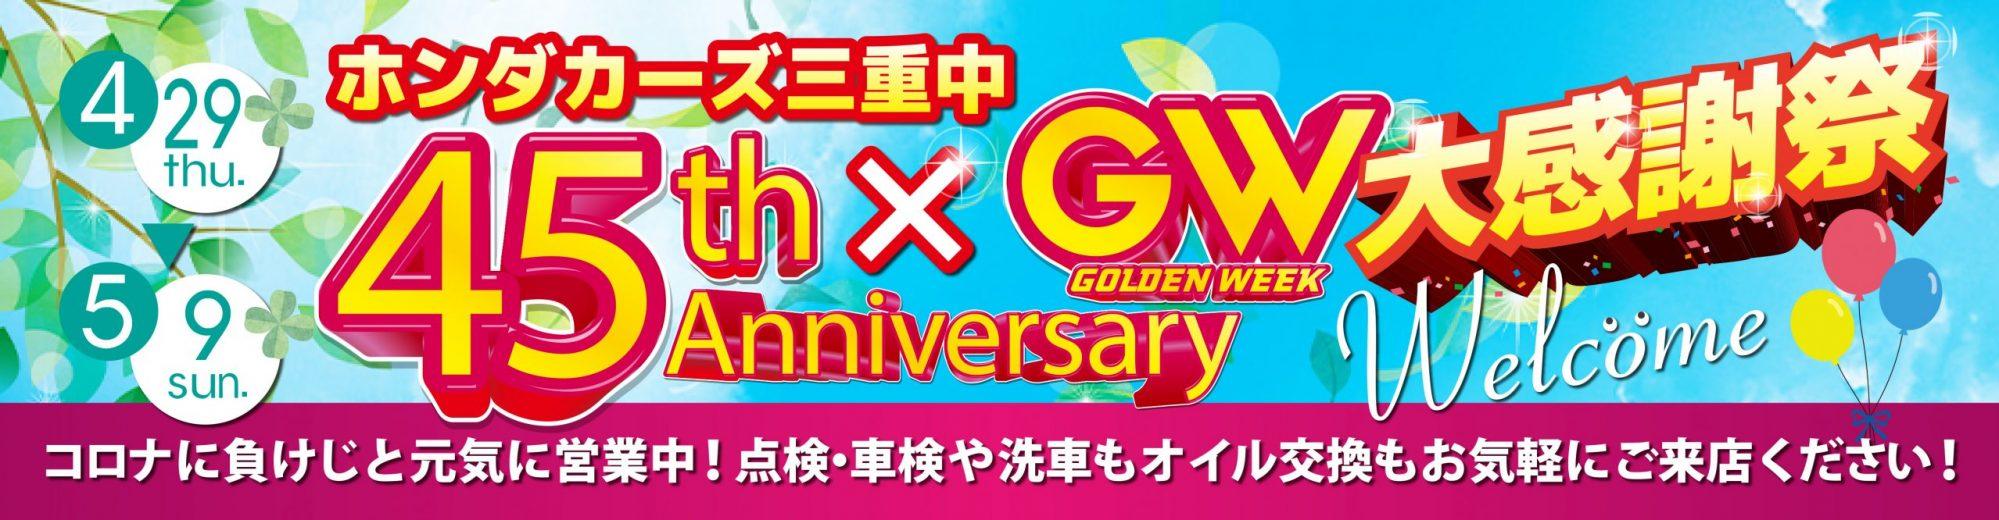 Honda Cars 三重中 45周年×GW大感謝祭